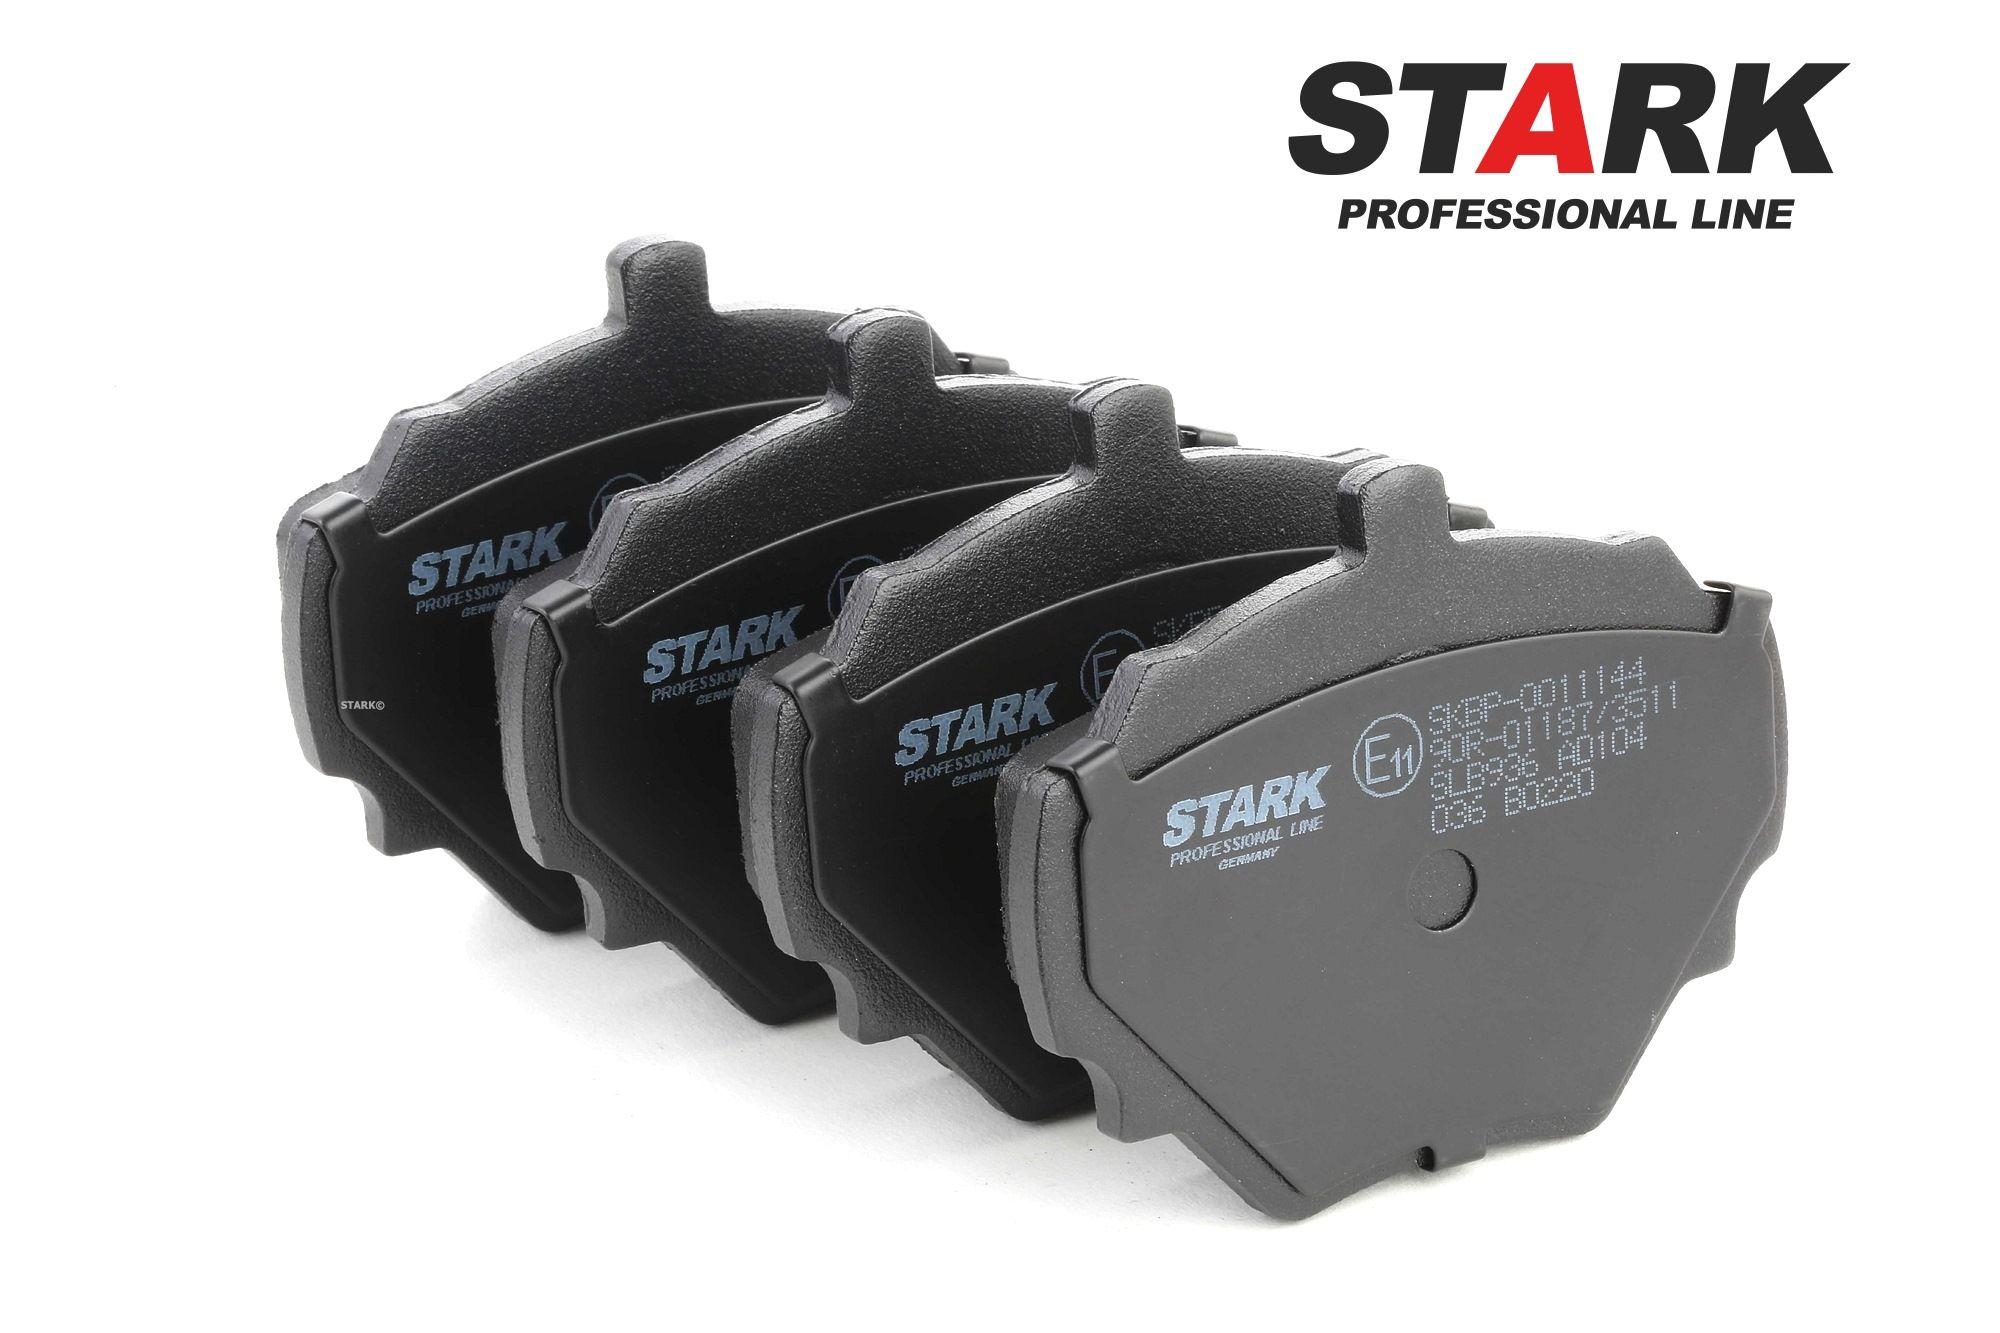 Bremsbelagsatz STARK SKBP-0011144 Bewertung